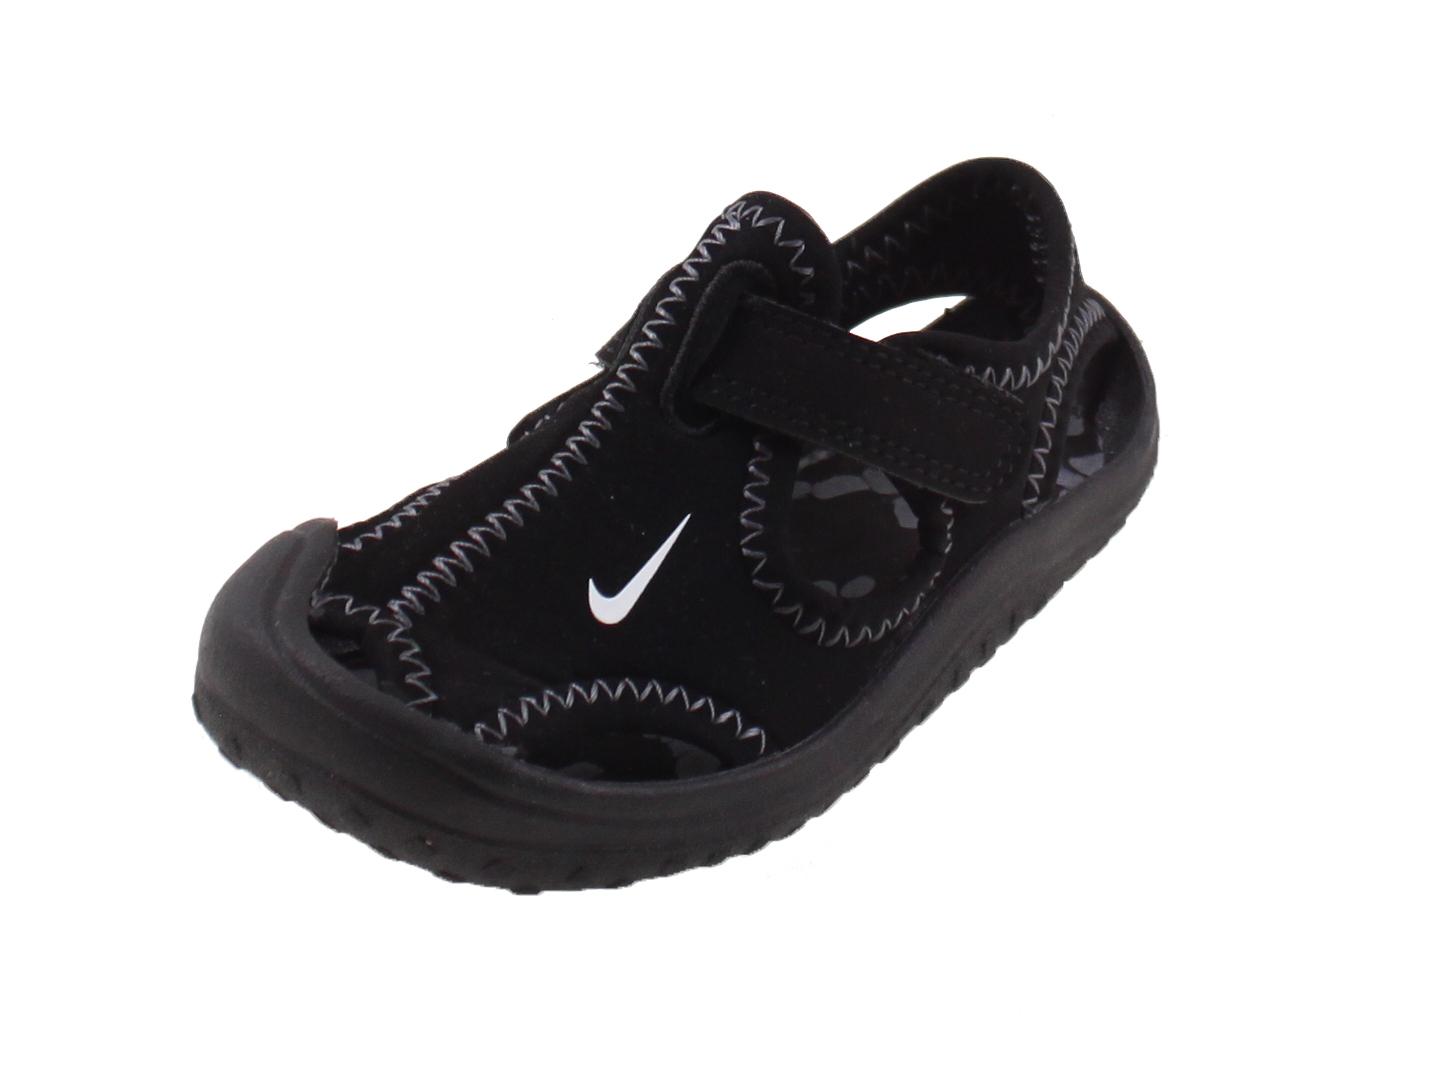 793863336f9 Nike Sunray protect Sandalen ZWART online kopen bij Sportpaleis.